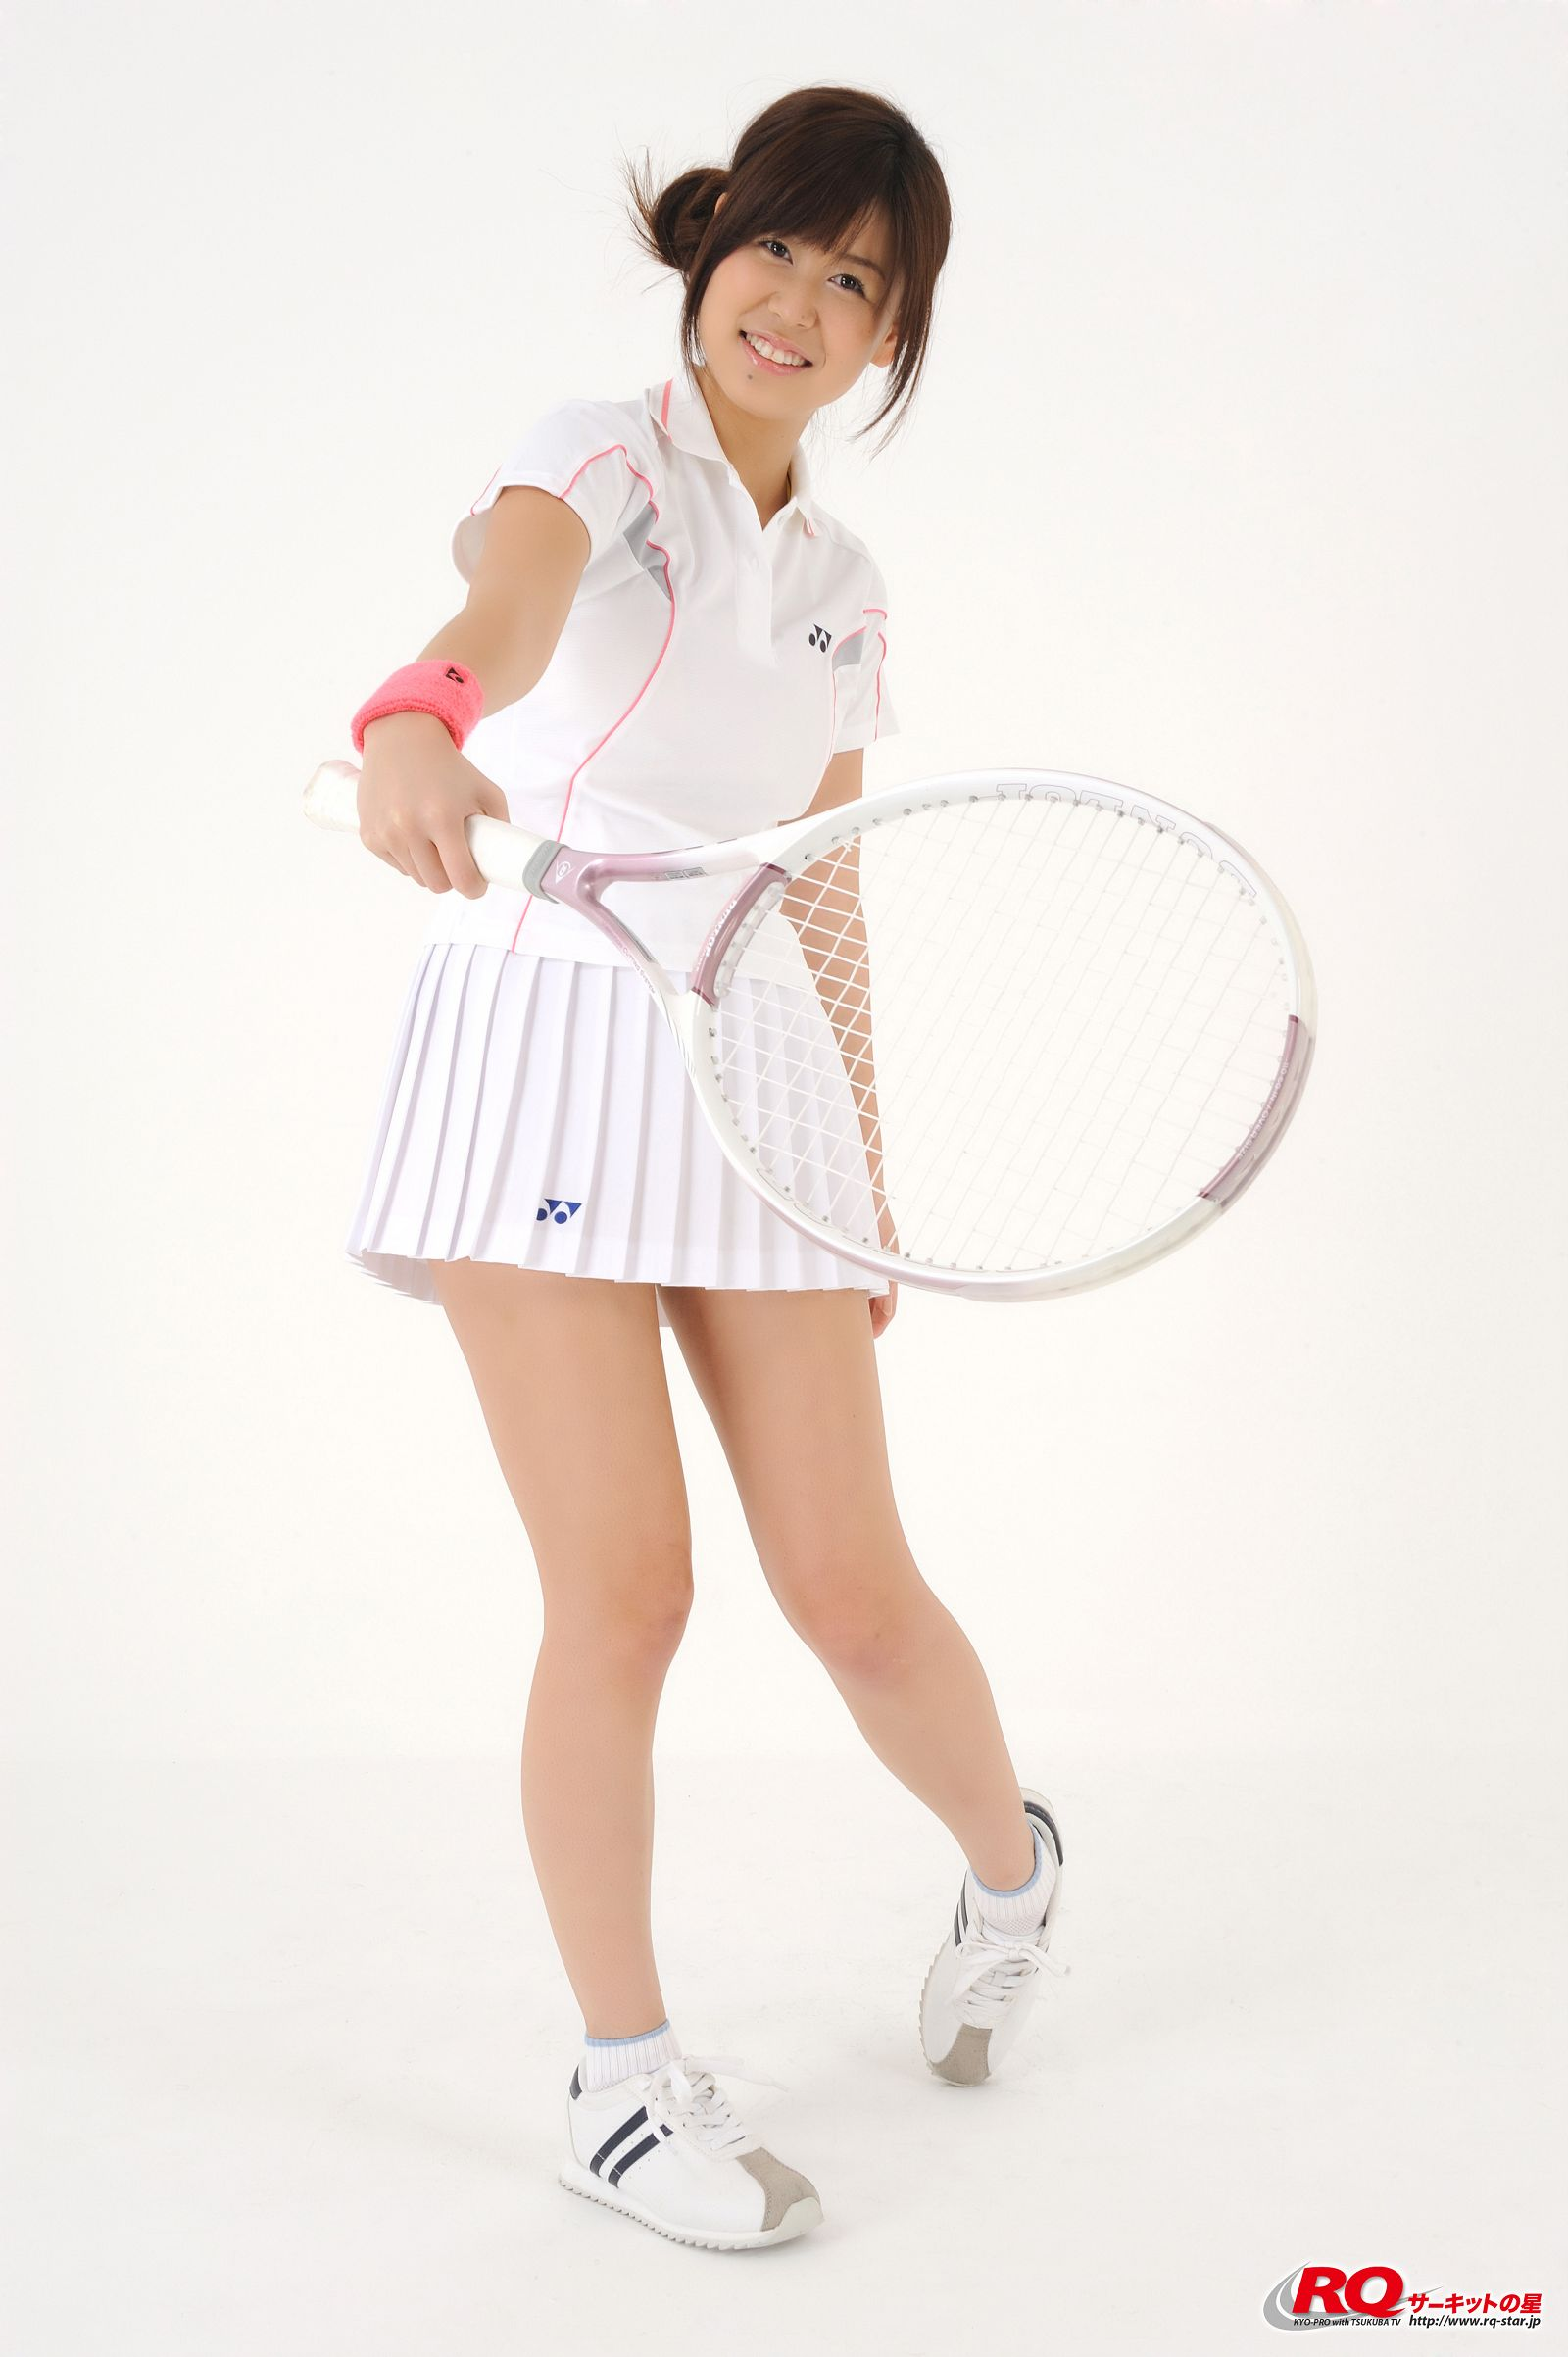 [RQ STAR美女] NO.01120 Airi Nagasaku 永作あいり Tennis Wea[50P] RQ STAR 第3张